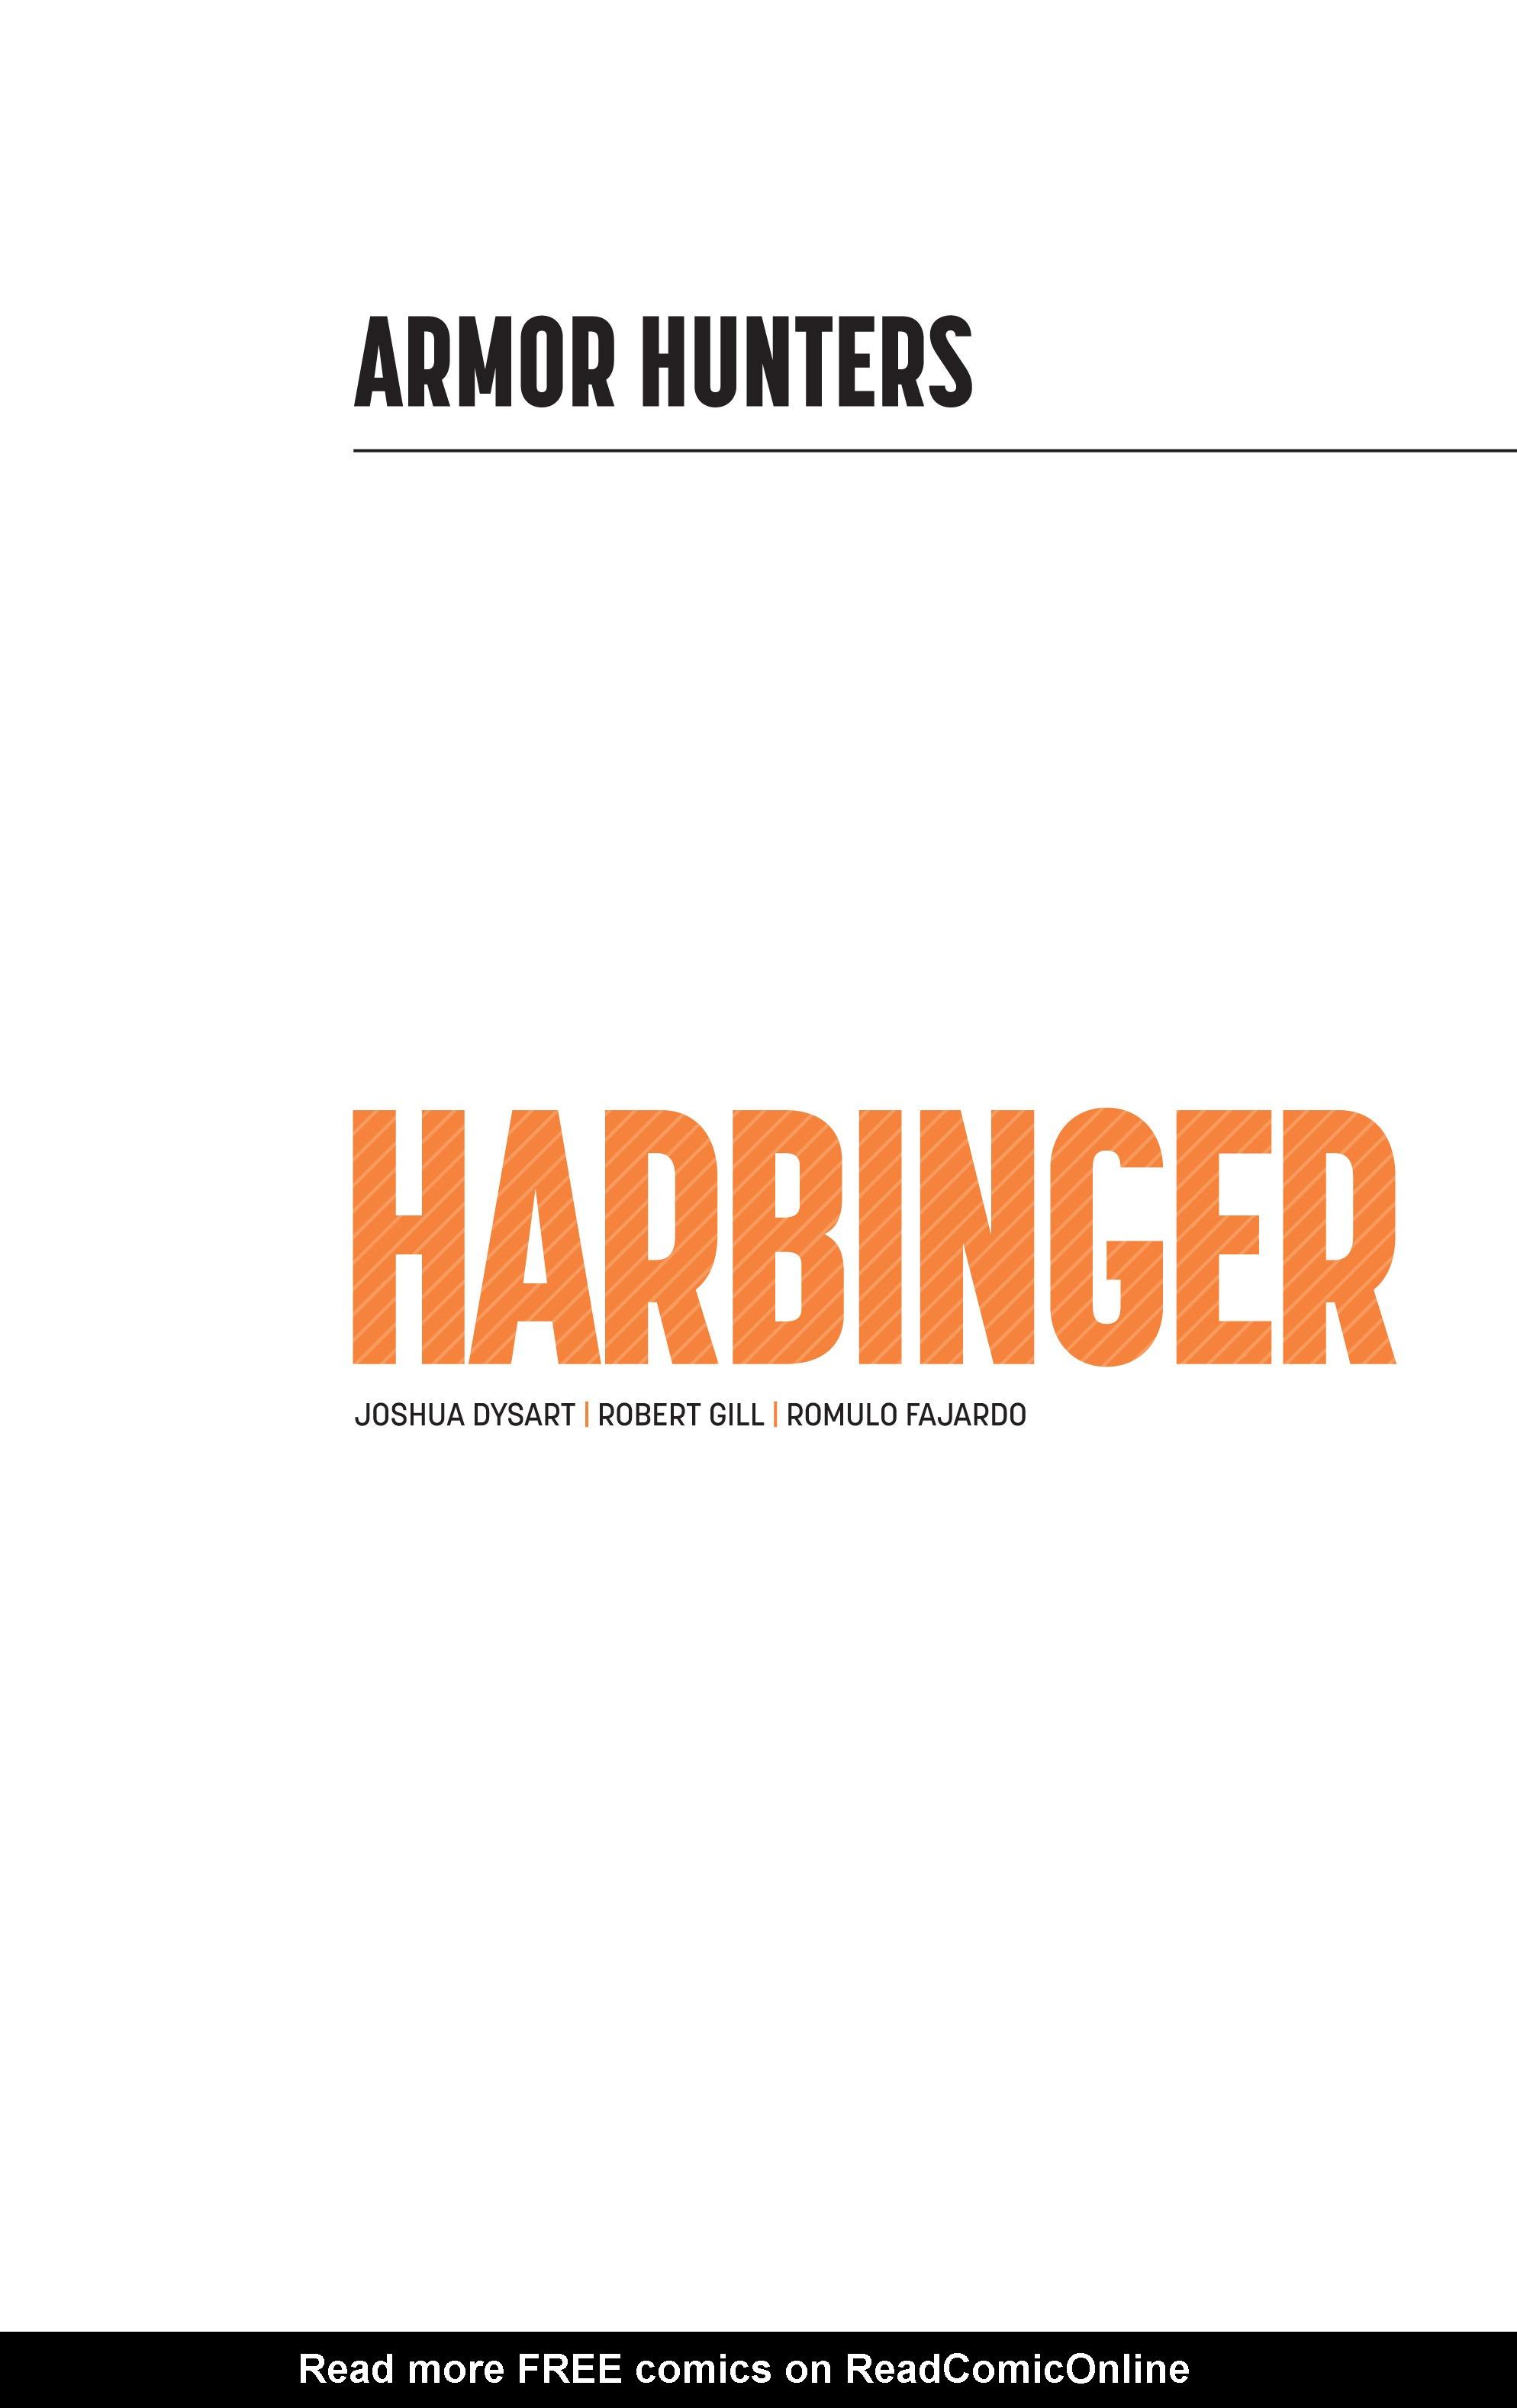 Read online Armor Hunters: Harbinger comic -  Issue # TPB - 2